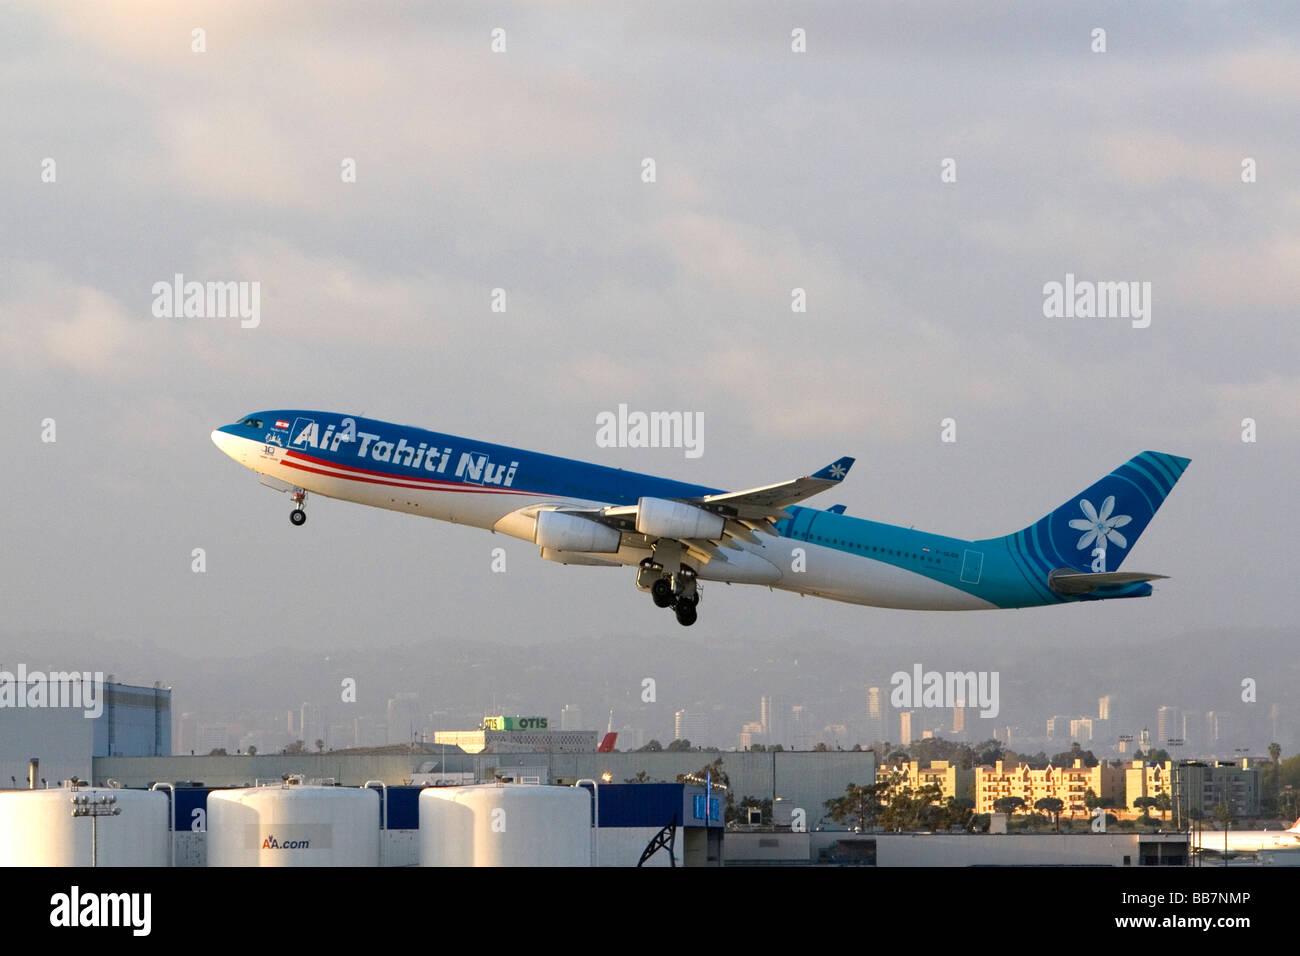 Air Tahiti Nui Airbus 340 a decollare da LAX a Los Angeles California USA Immagini Stock